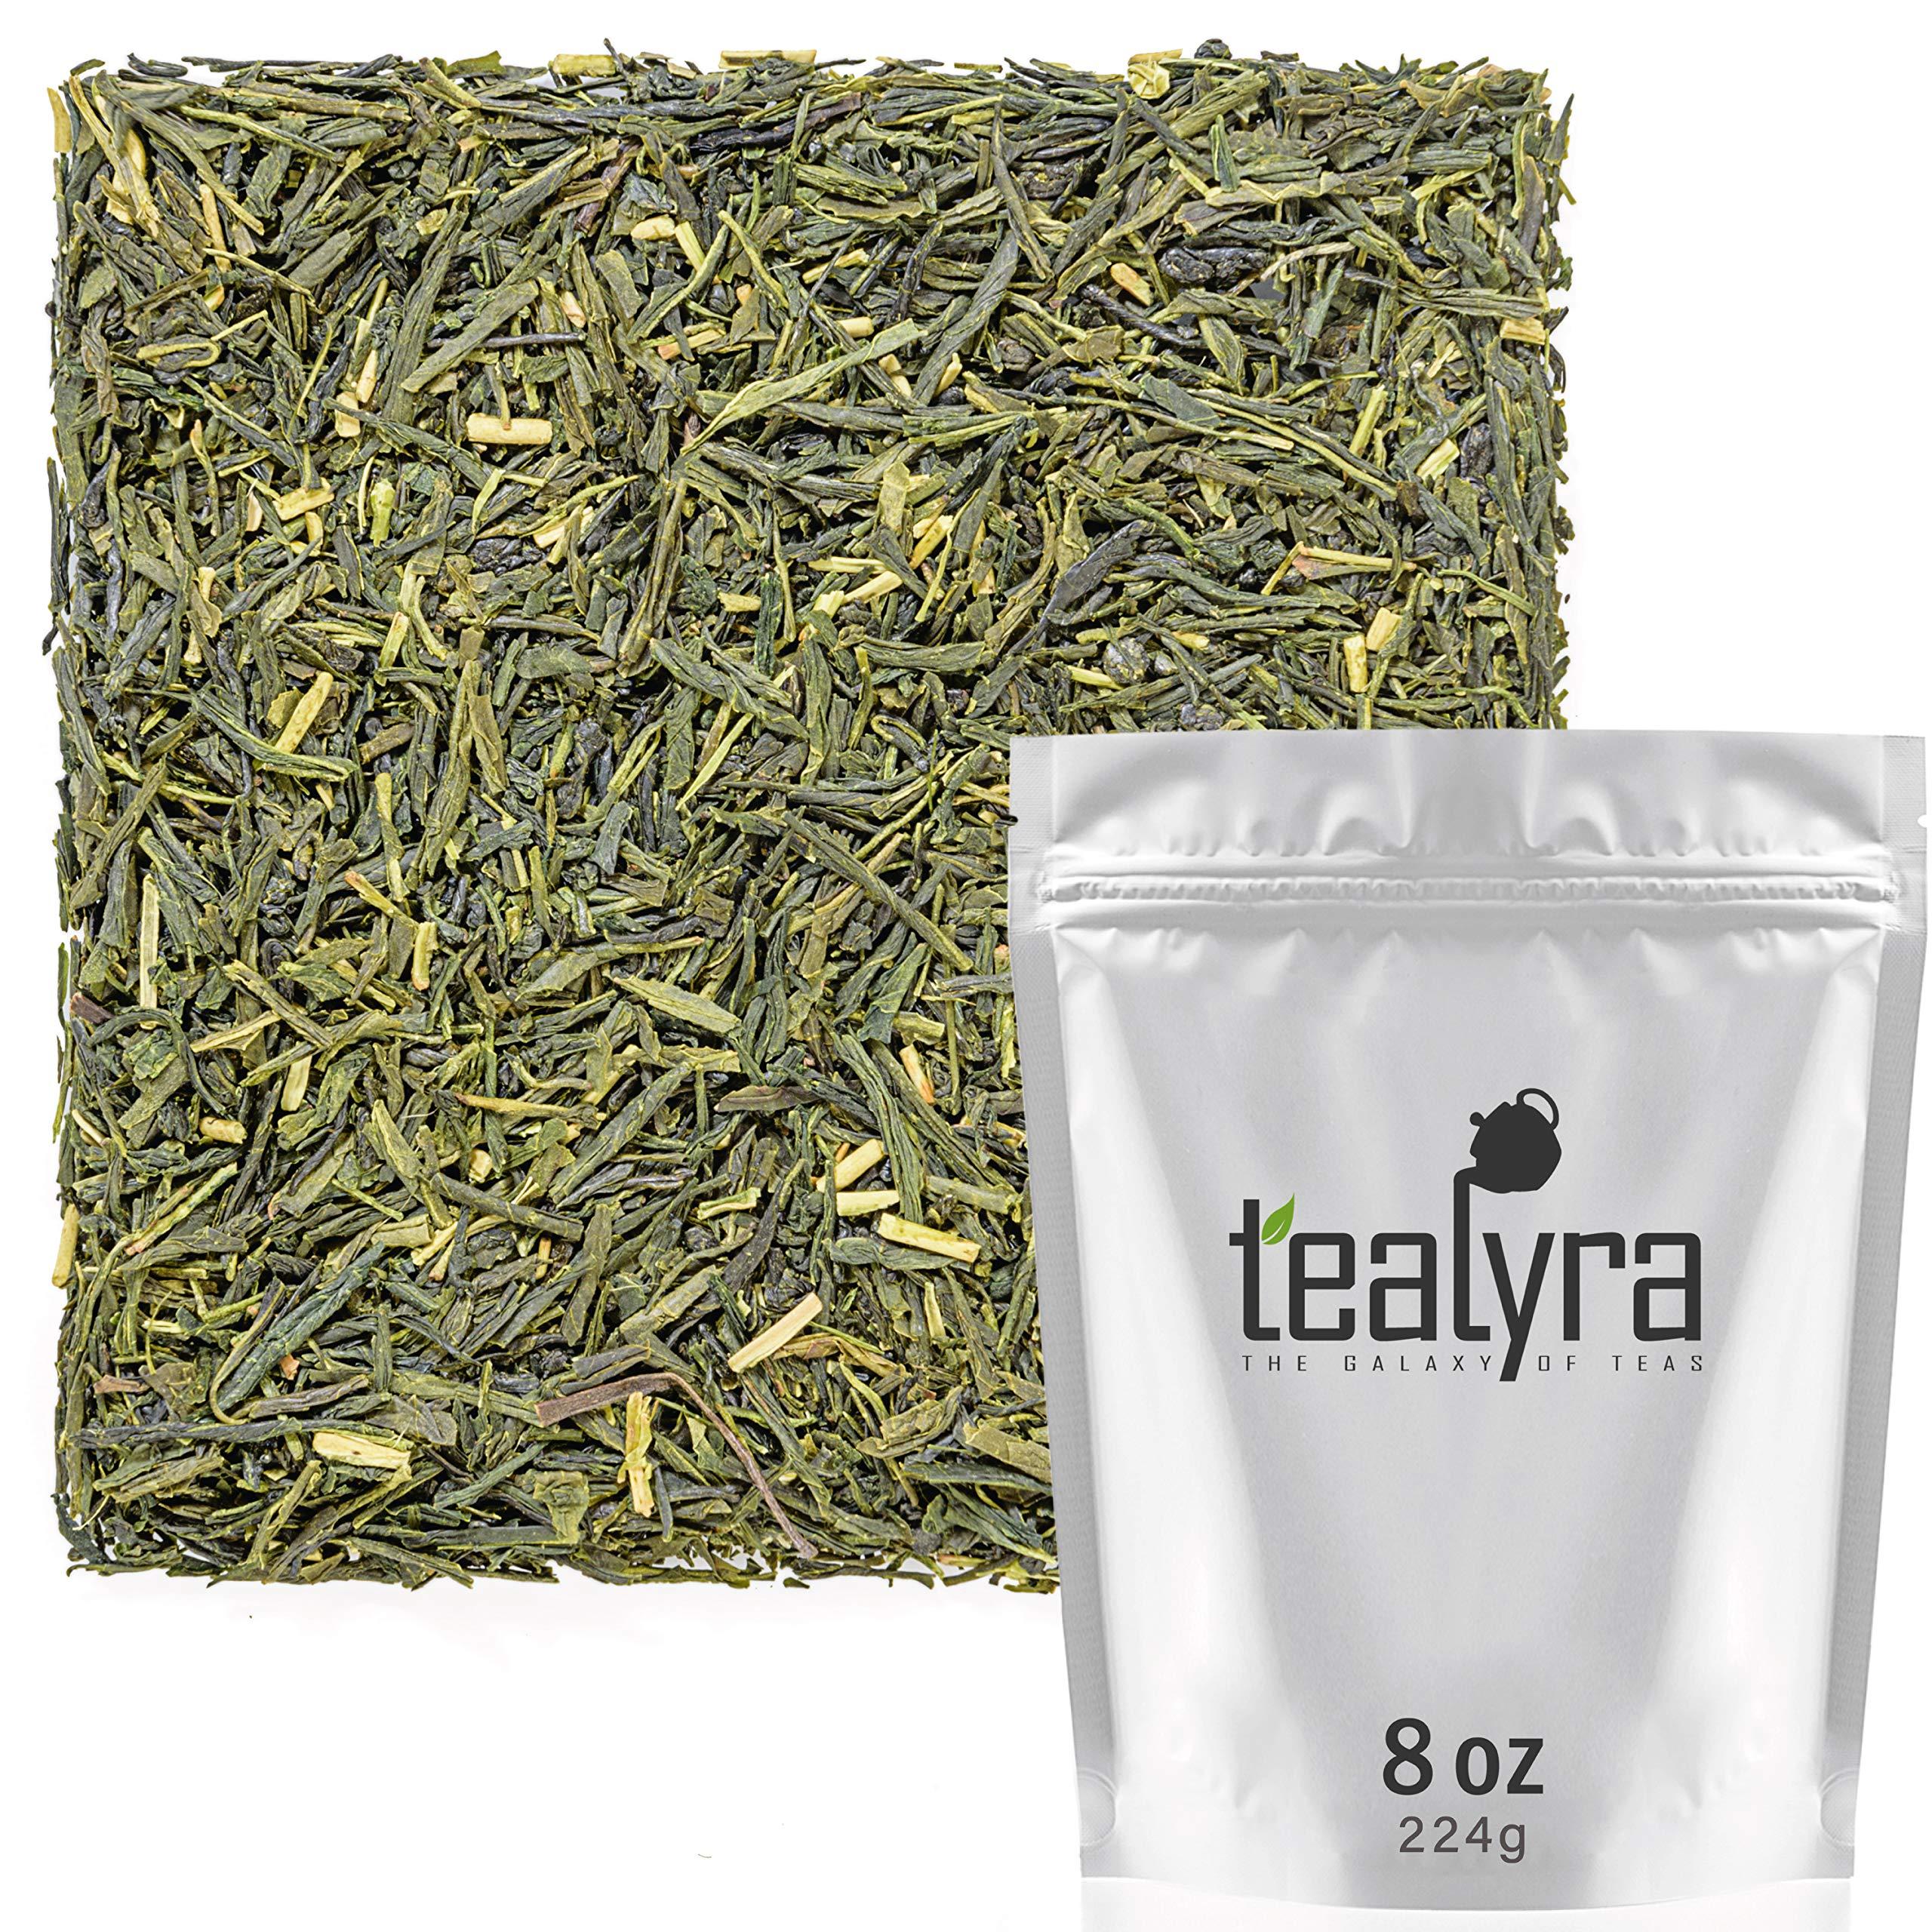 Tealyra - Sencha Satsuma - Japanese Green Tea - Luxury Loose Tea - Rich Taste Pure Green Tea - Antioxidants Rich - Low Caffeine - 224g (8-ounce) by Tealyra